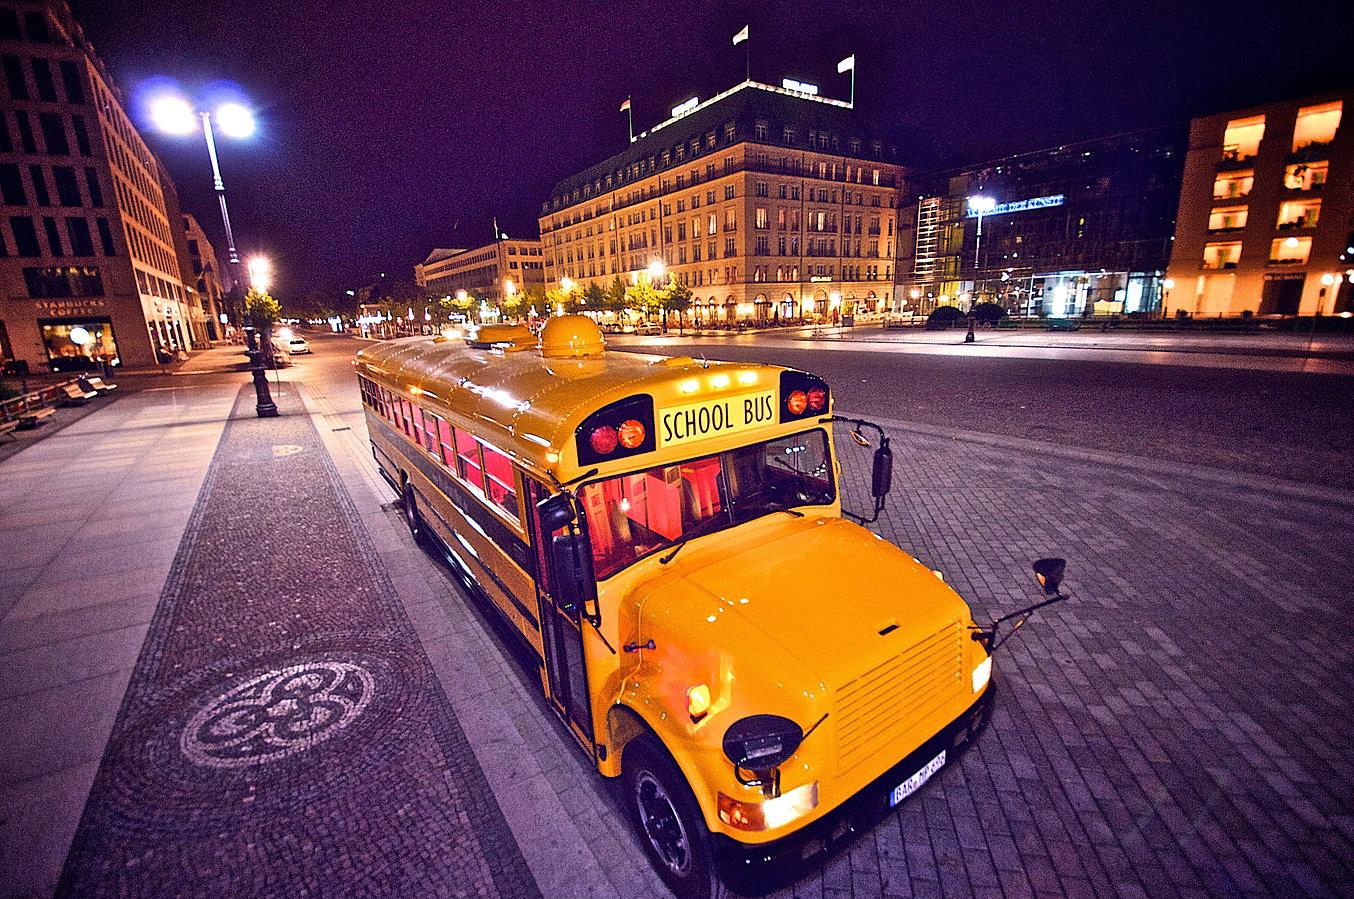 partybusse eventbusse berlin preise school bus. Black Bedroom Furniture Sets. Home Design Ideas